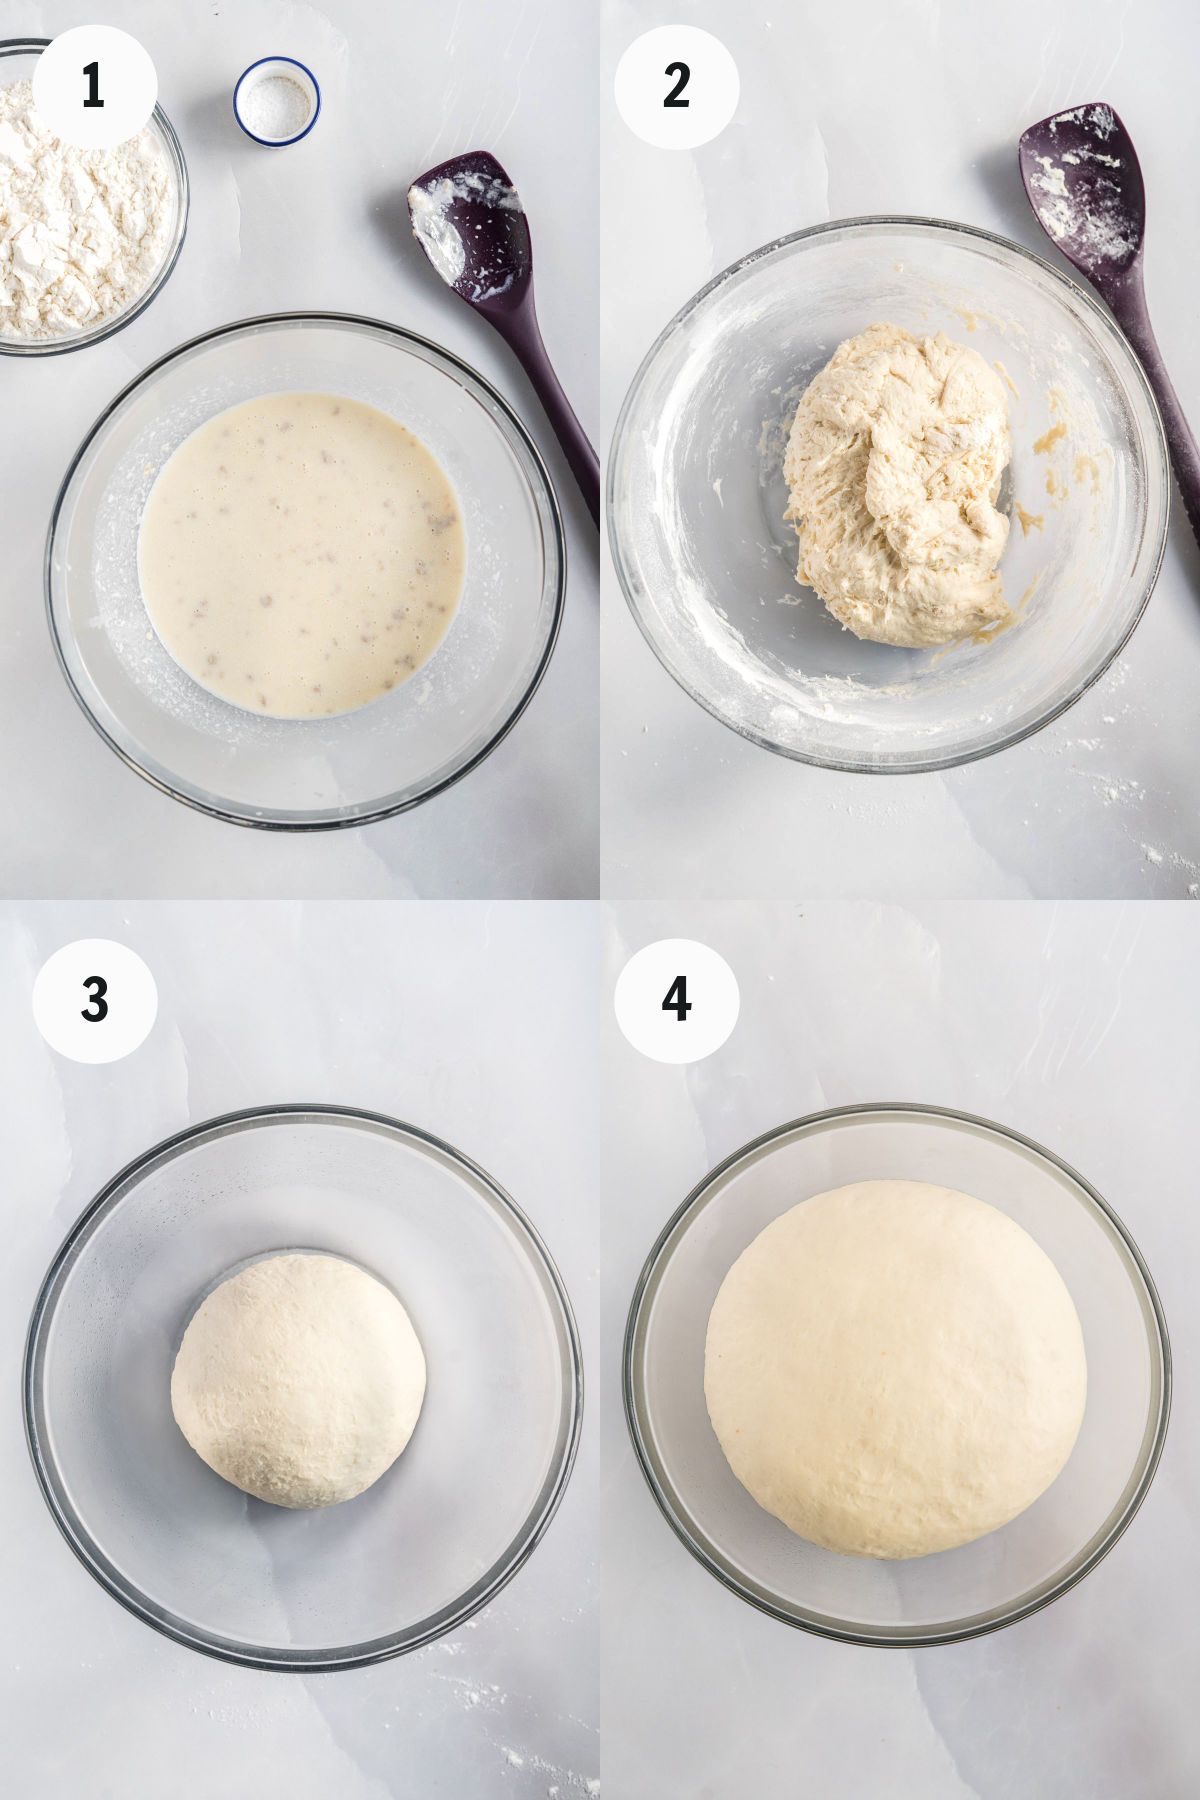 Process of mixing and rising dough.